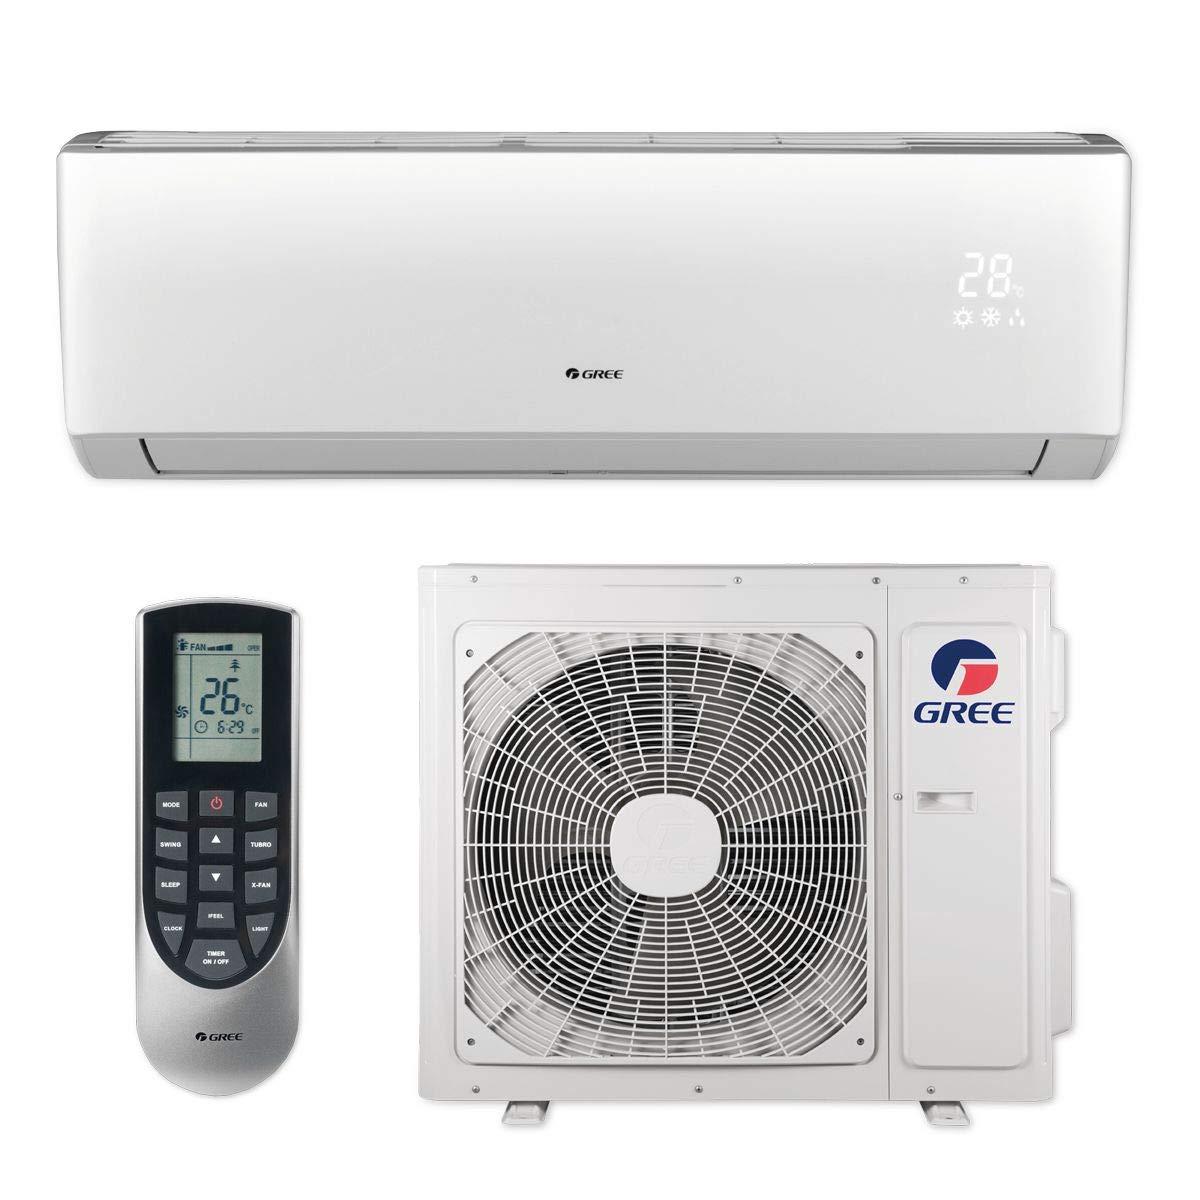 GREE 24,000 BTU 16 SEER LIVO+ Wall Mount Ductless Mini Split Air Conditioner Heat Pump 208/230V